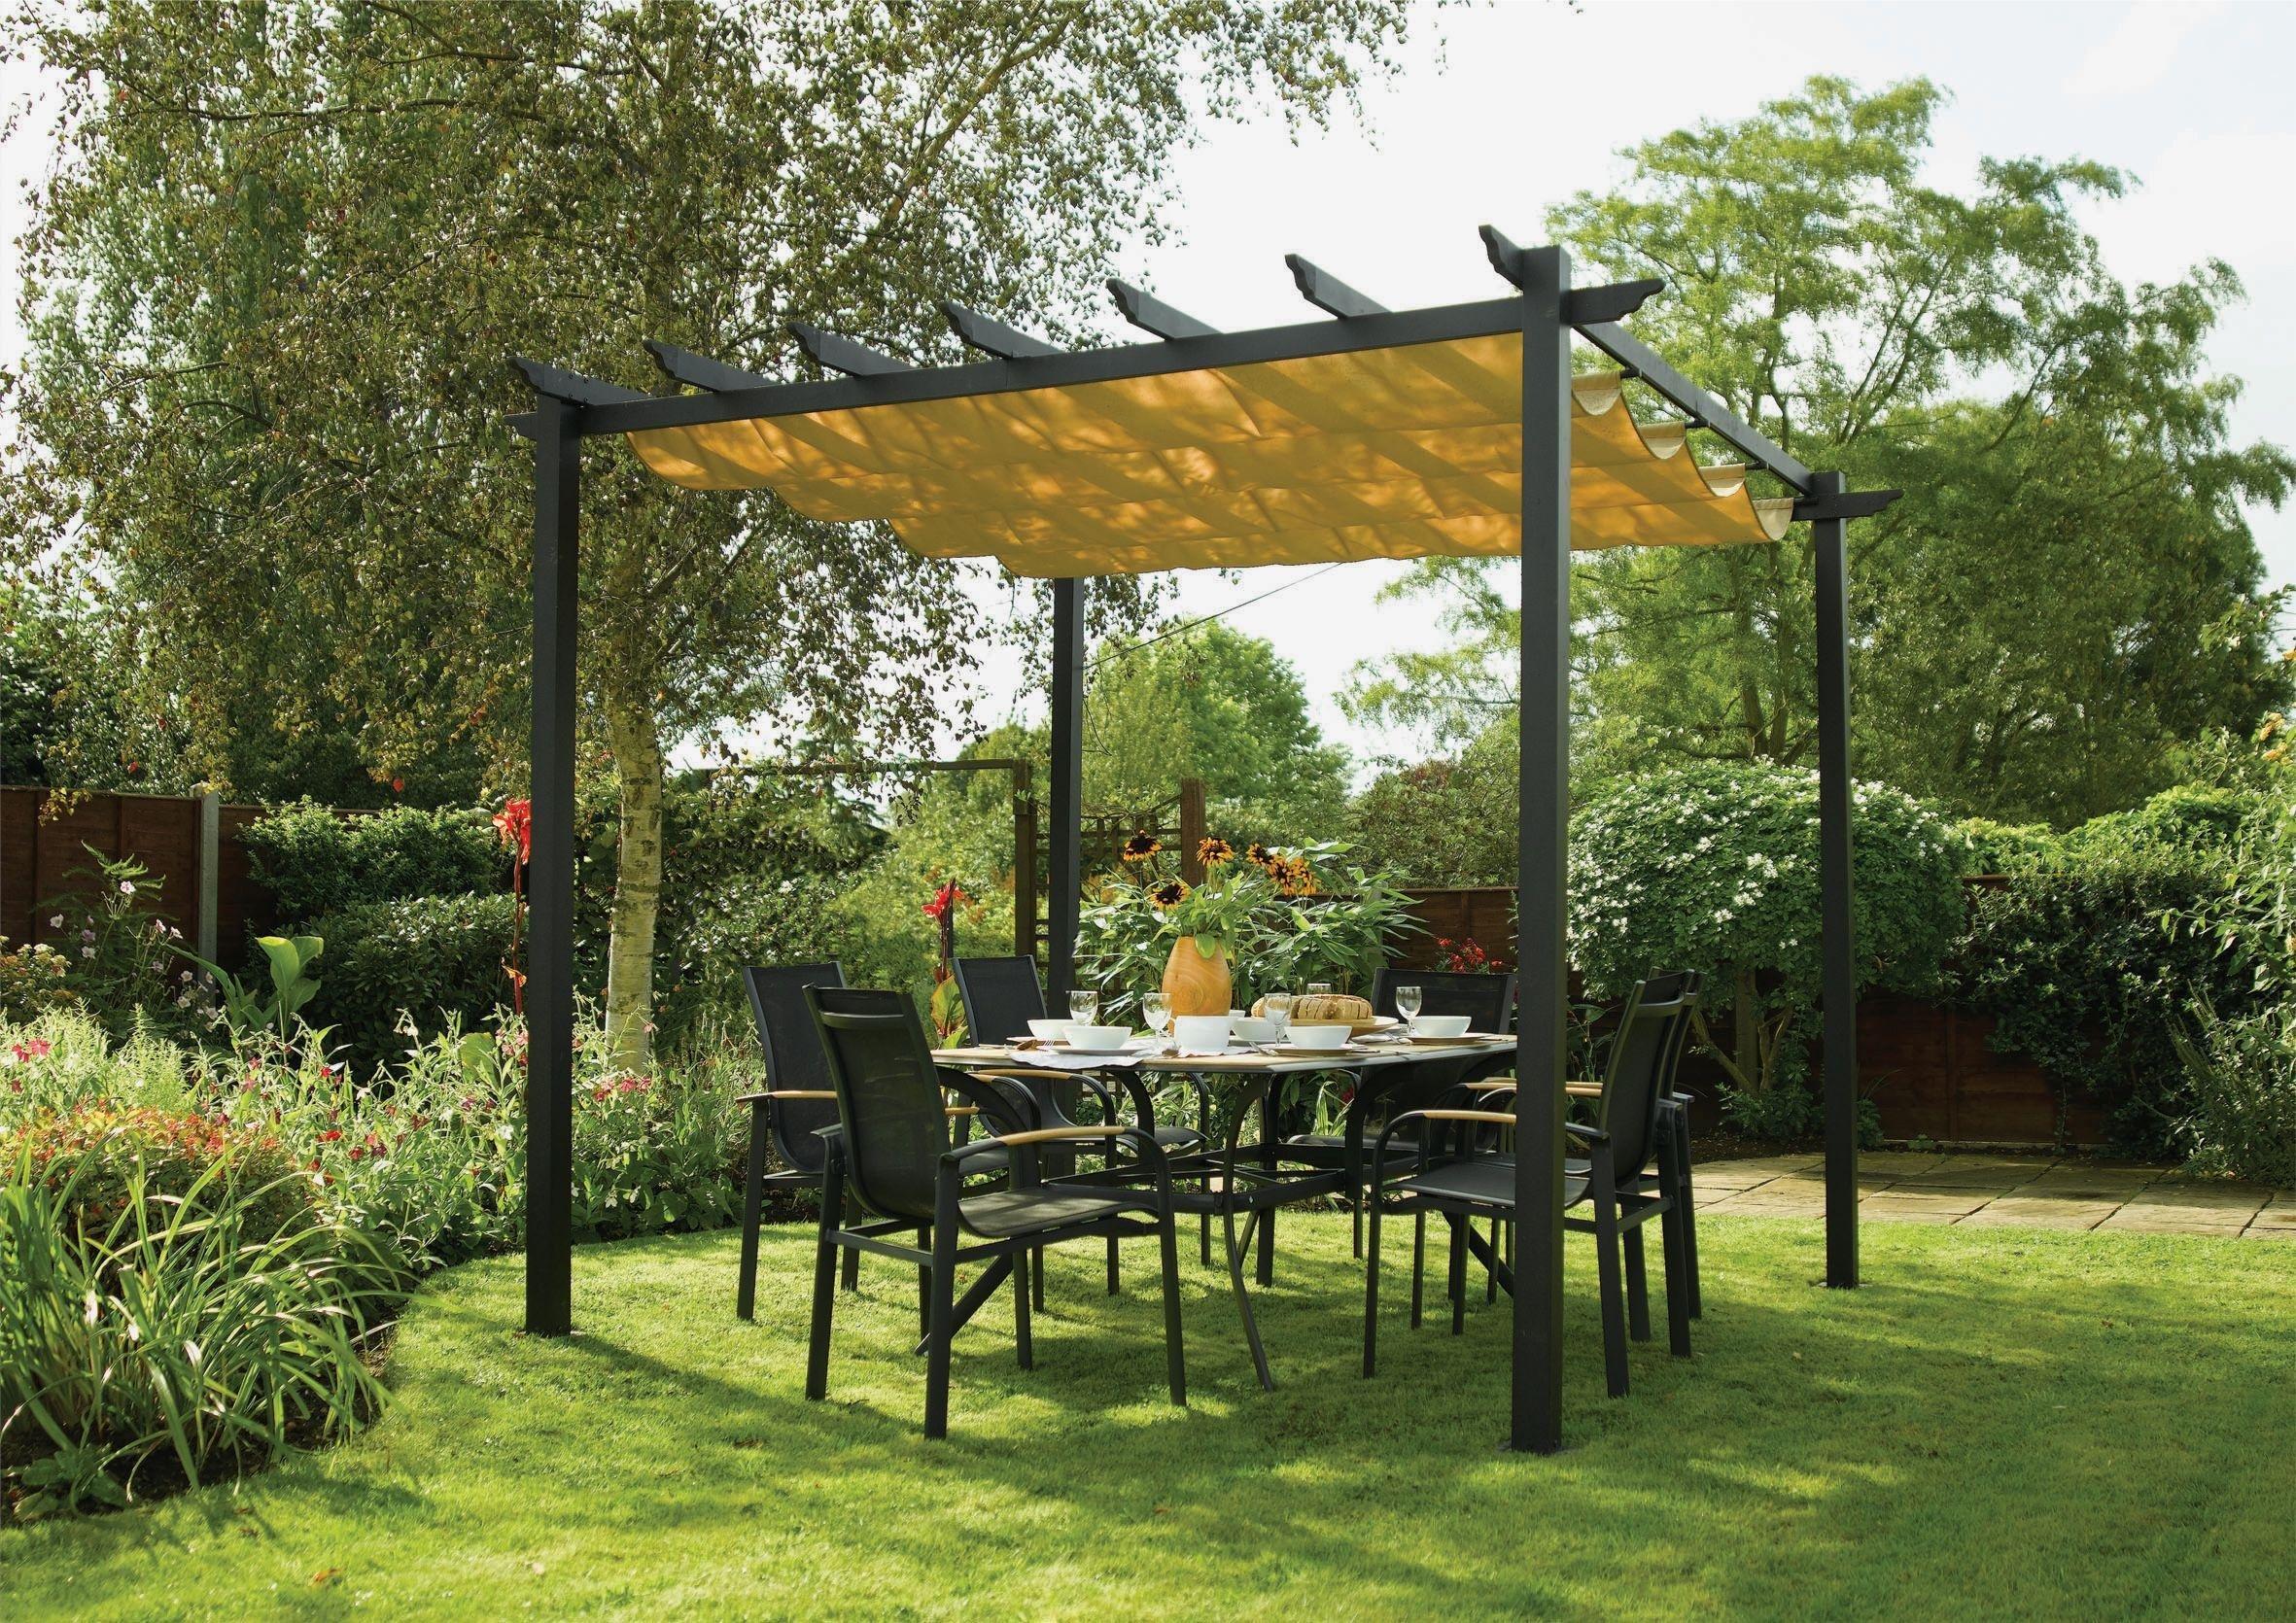 Rowlinson Latina Aluminium Frame Canopy - 9 x 9ft. lowest price